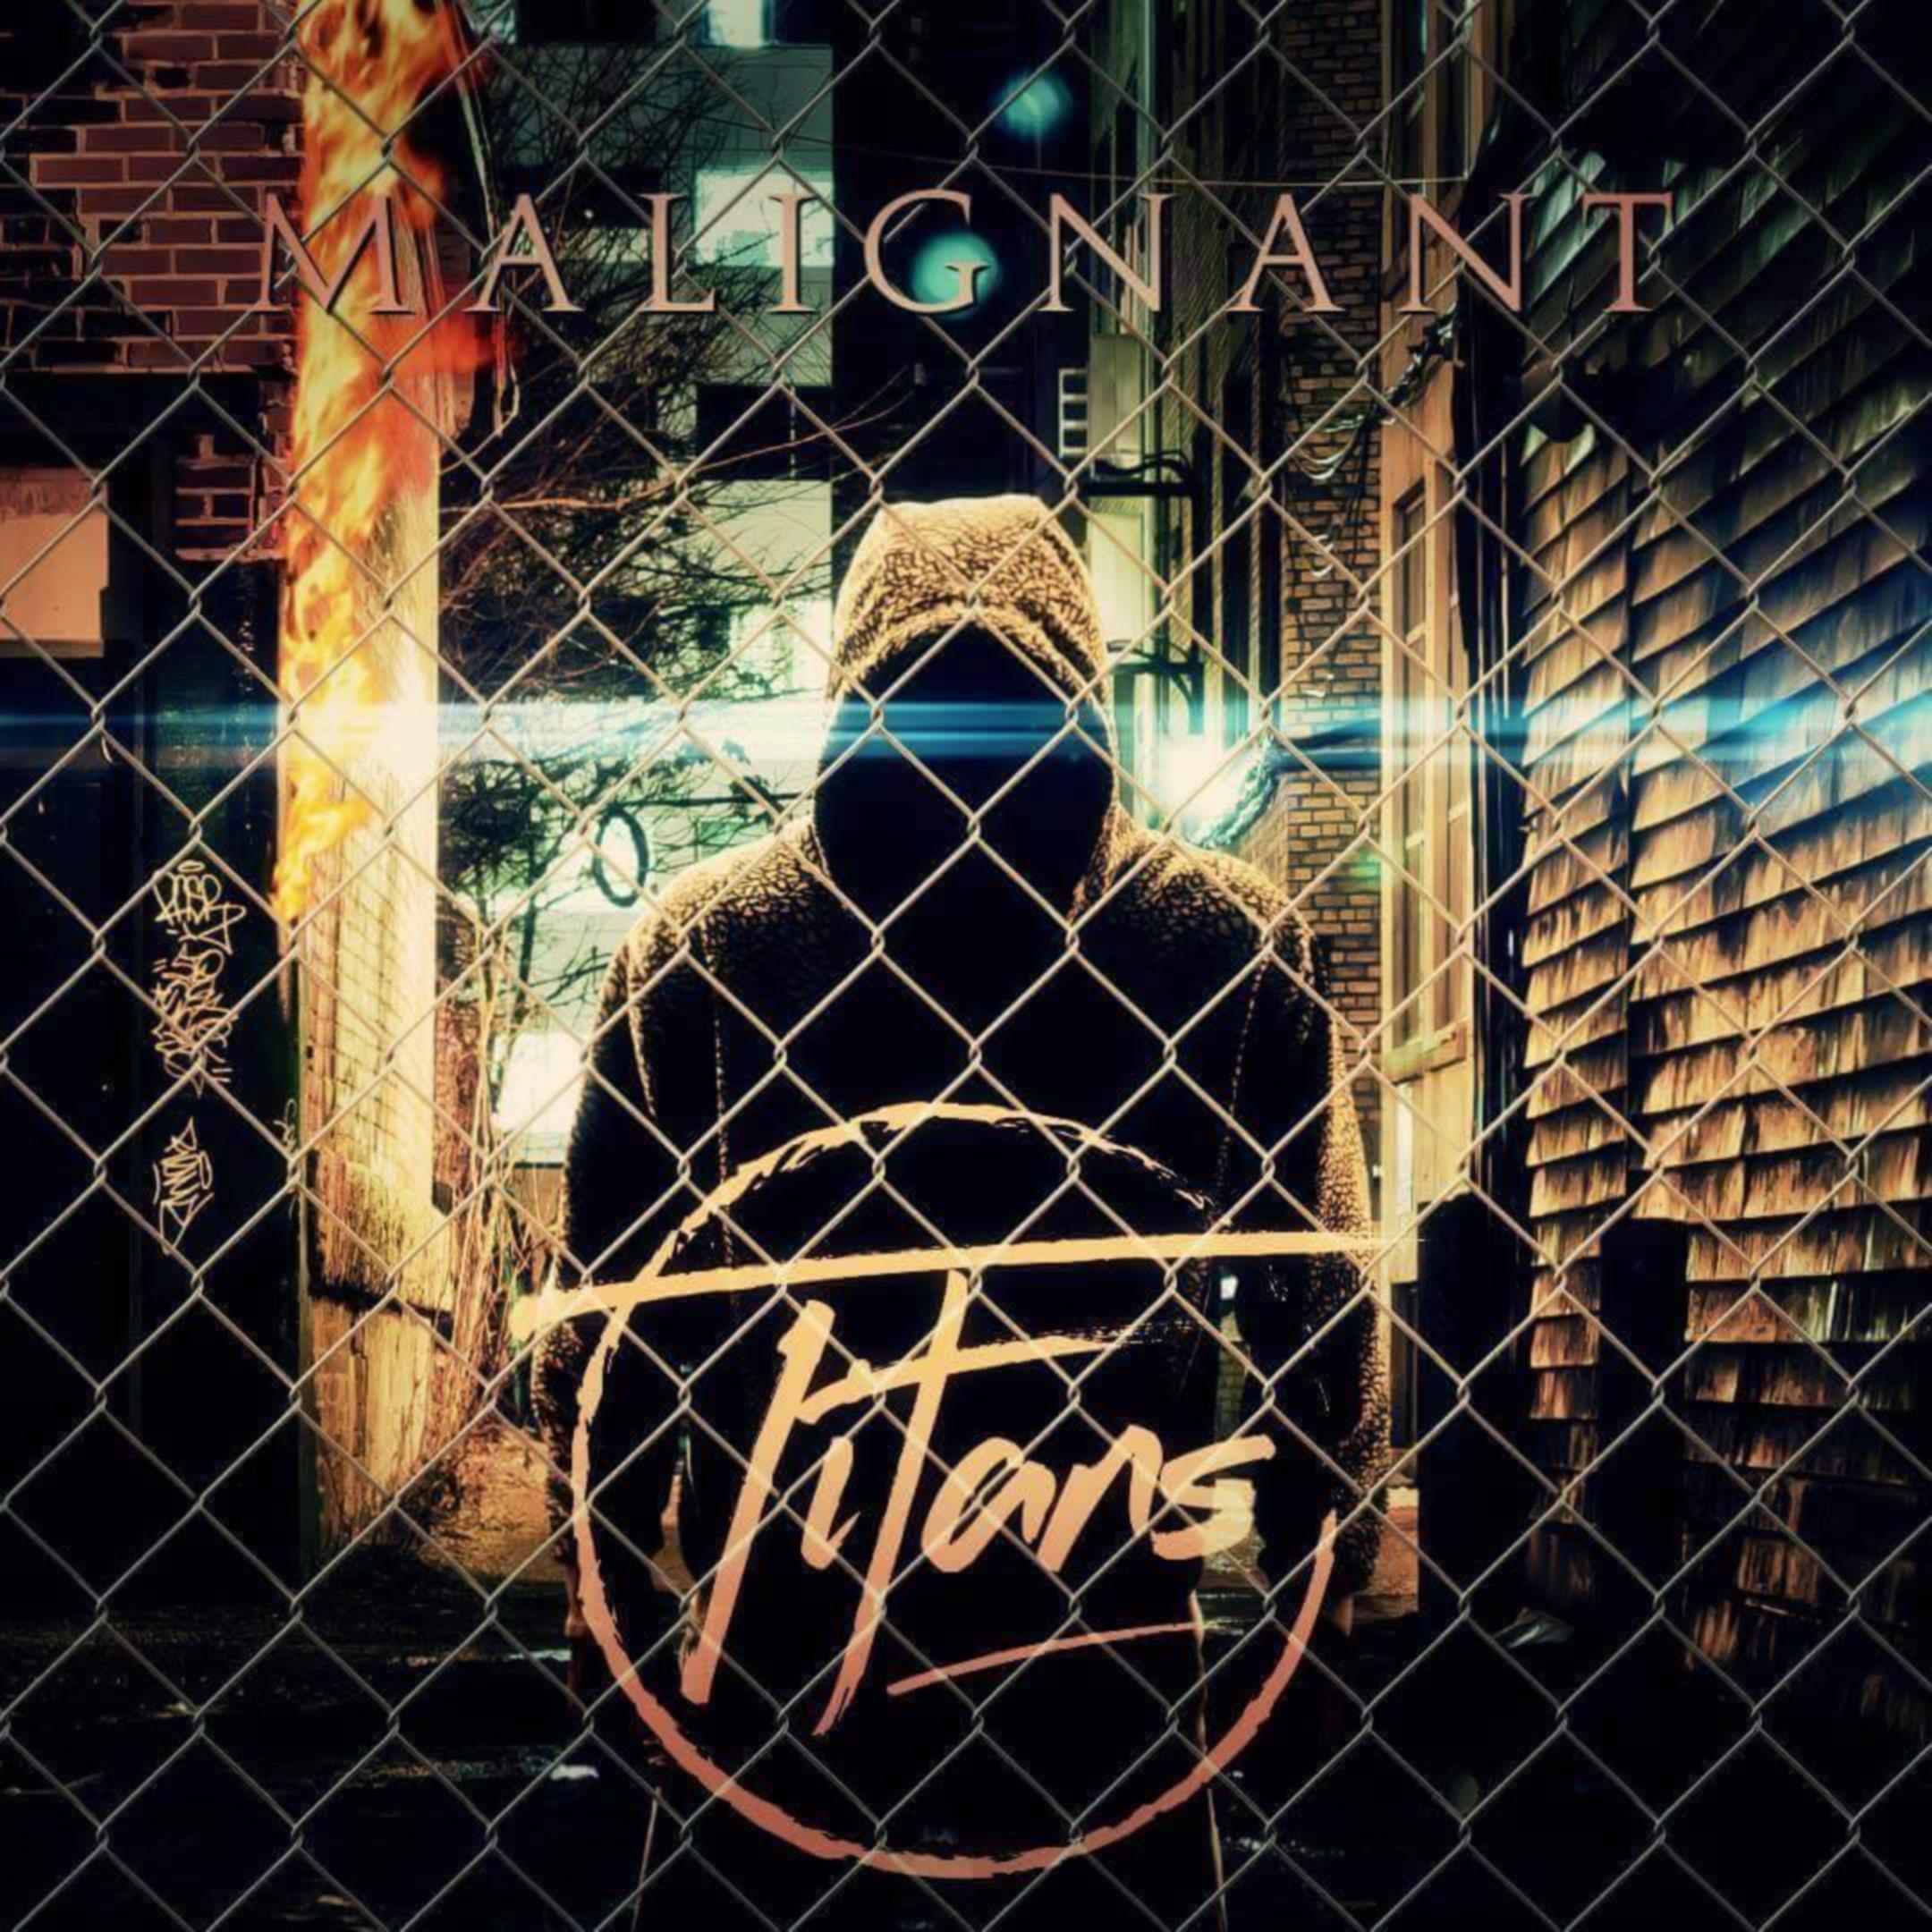 Titans - Malignant [EP] (2016)